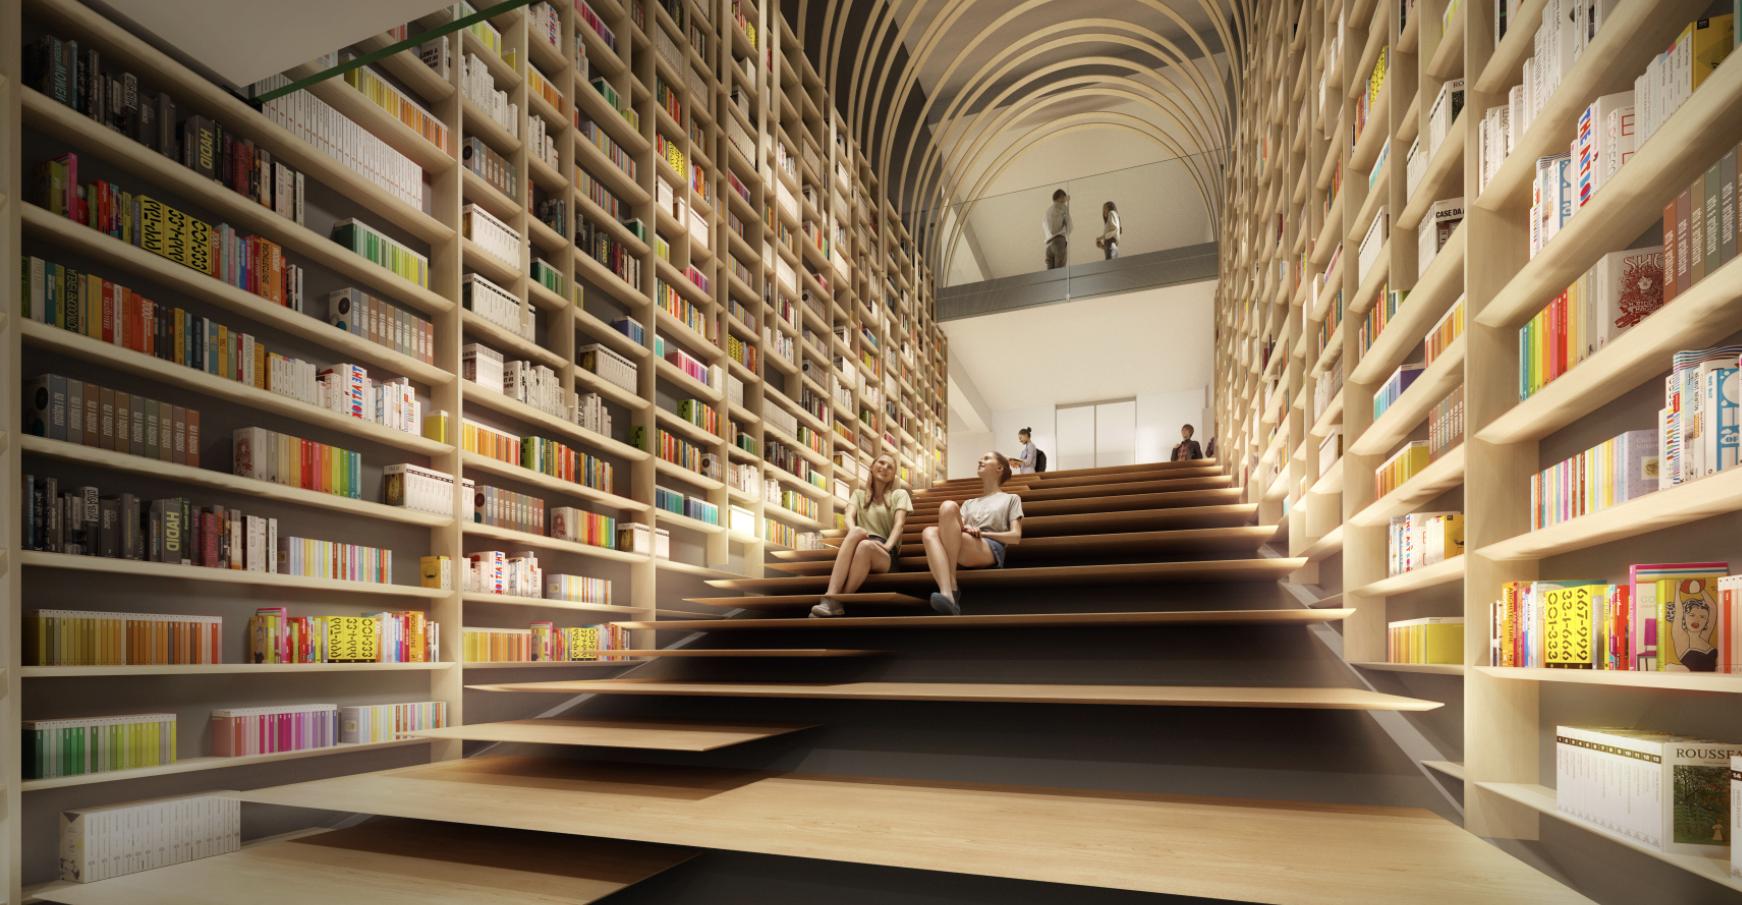 The new Haruki Murakami Library at Tokyo's Waseda University will open in 2021